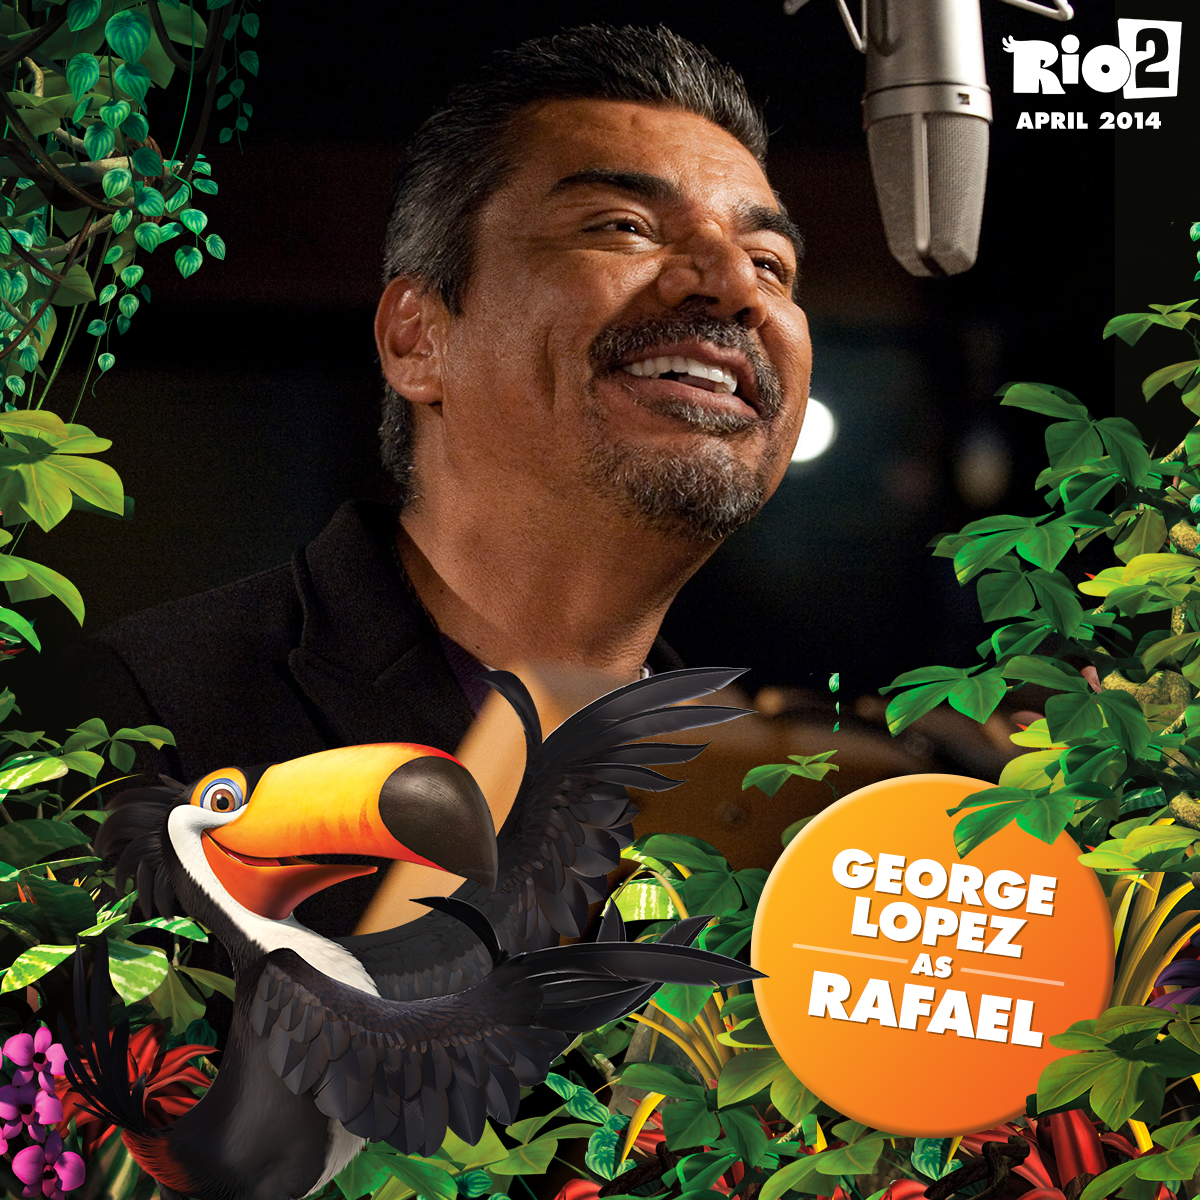 If Anyone Can Do It Toucan Rafael Returns To The Jungle In Rio2 Voiced By Georgelopez George Lopez Rodrigo Santoro Rio 2